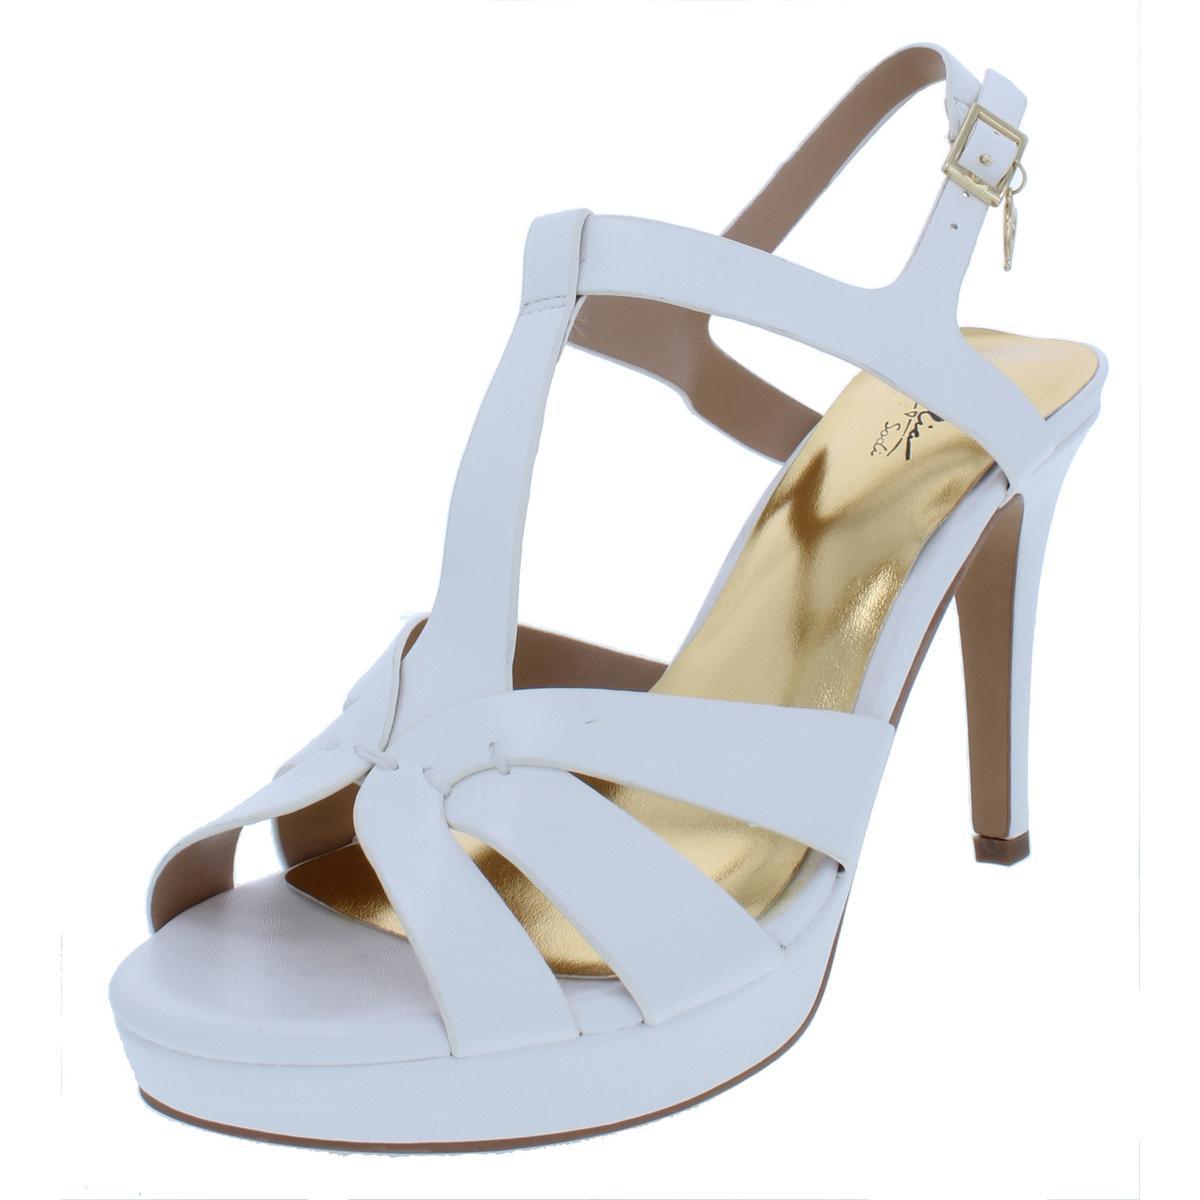 767a26c08a5b Details about Thalia Sodi Womens Velda White Platform Sandals Shoes 9 Wide  (C